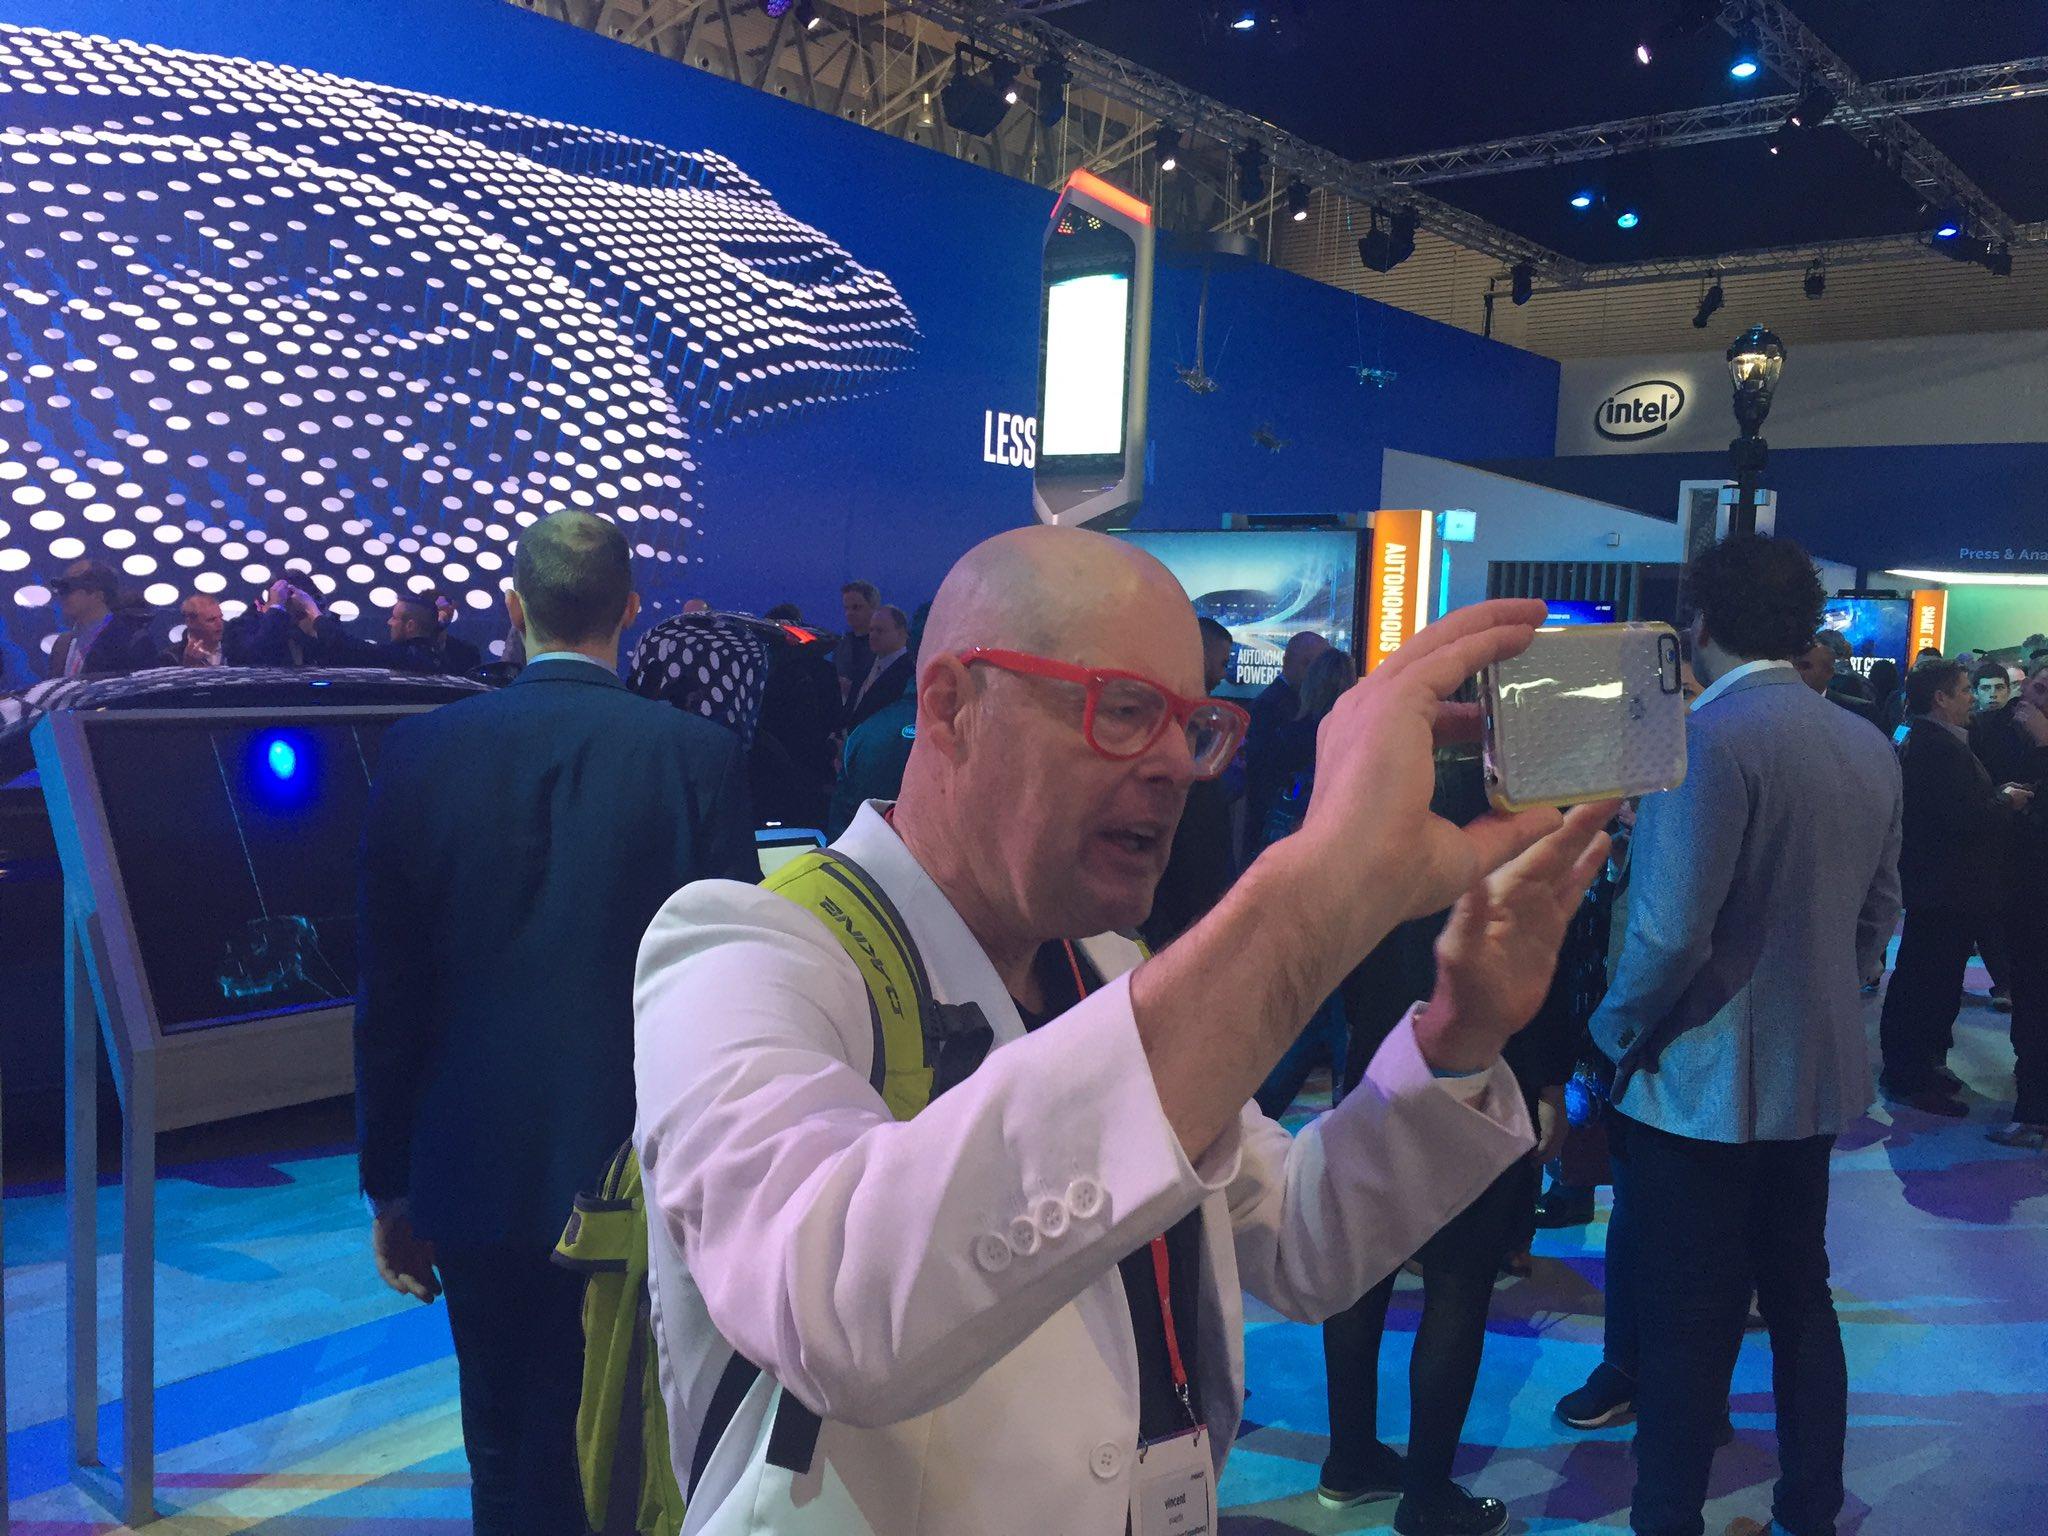 Innovatie ambassadeur @vincente #mwc17 https://t.co/xCdpxq55k0